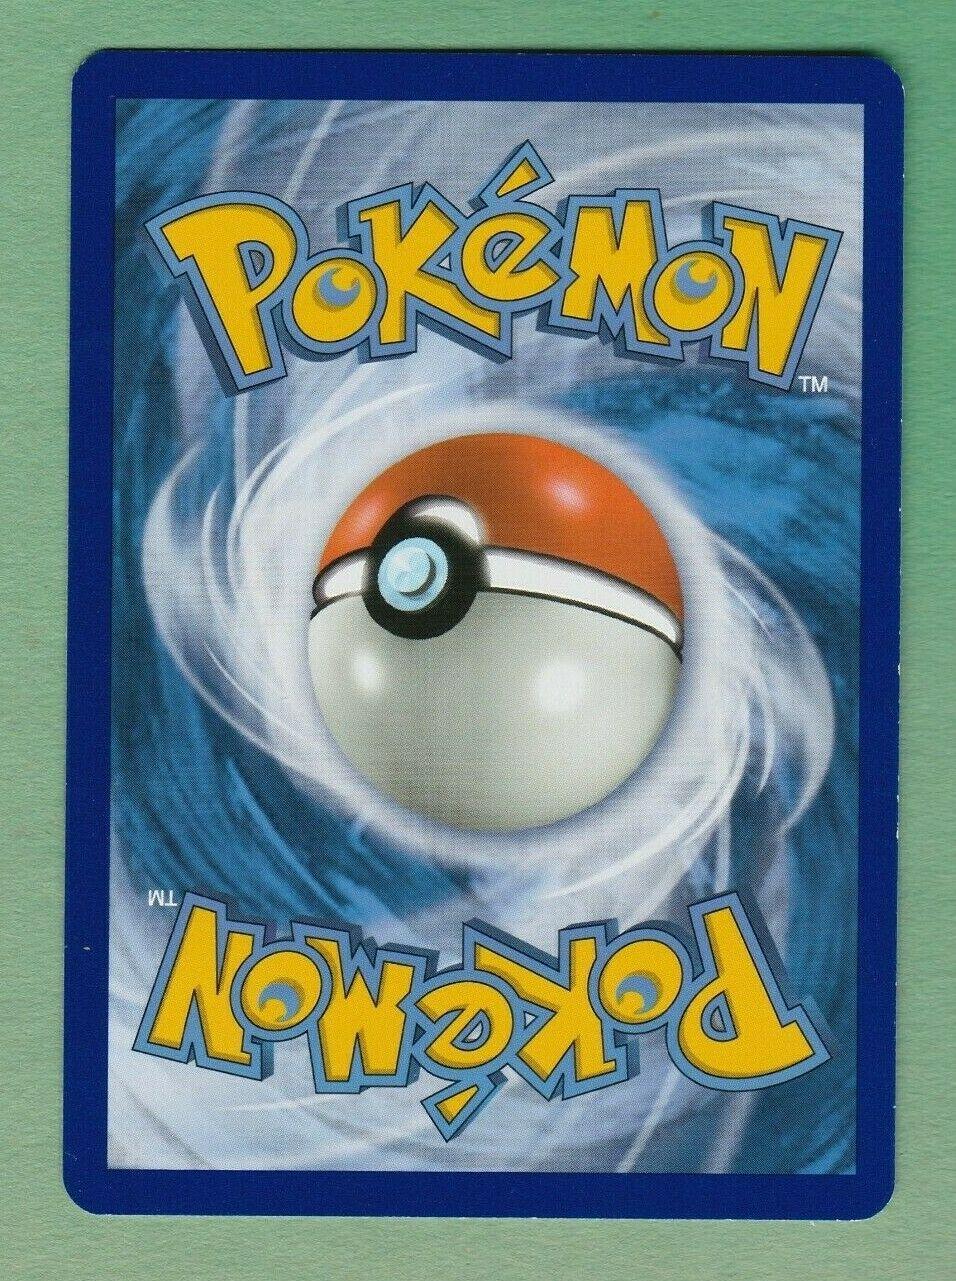 Pokemon Dragon Majesty Kommo-o Holo Rare, 54/70 NM-MT - Image 2